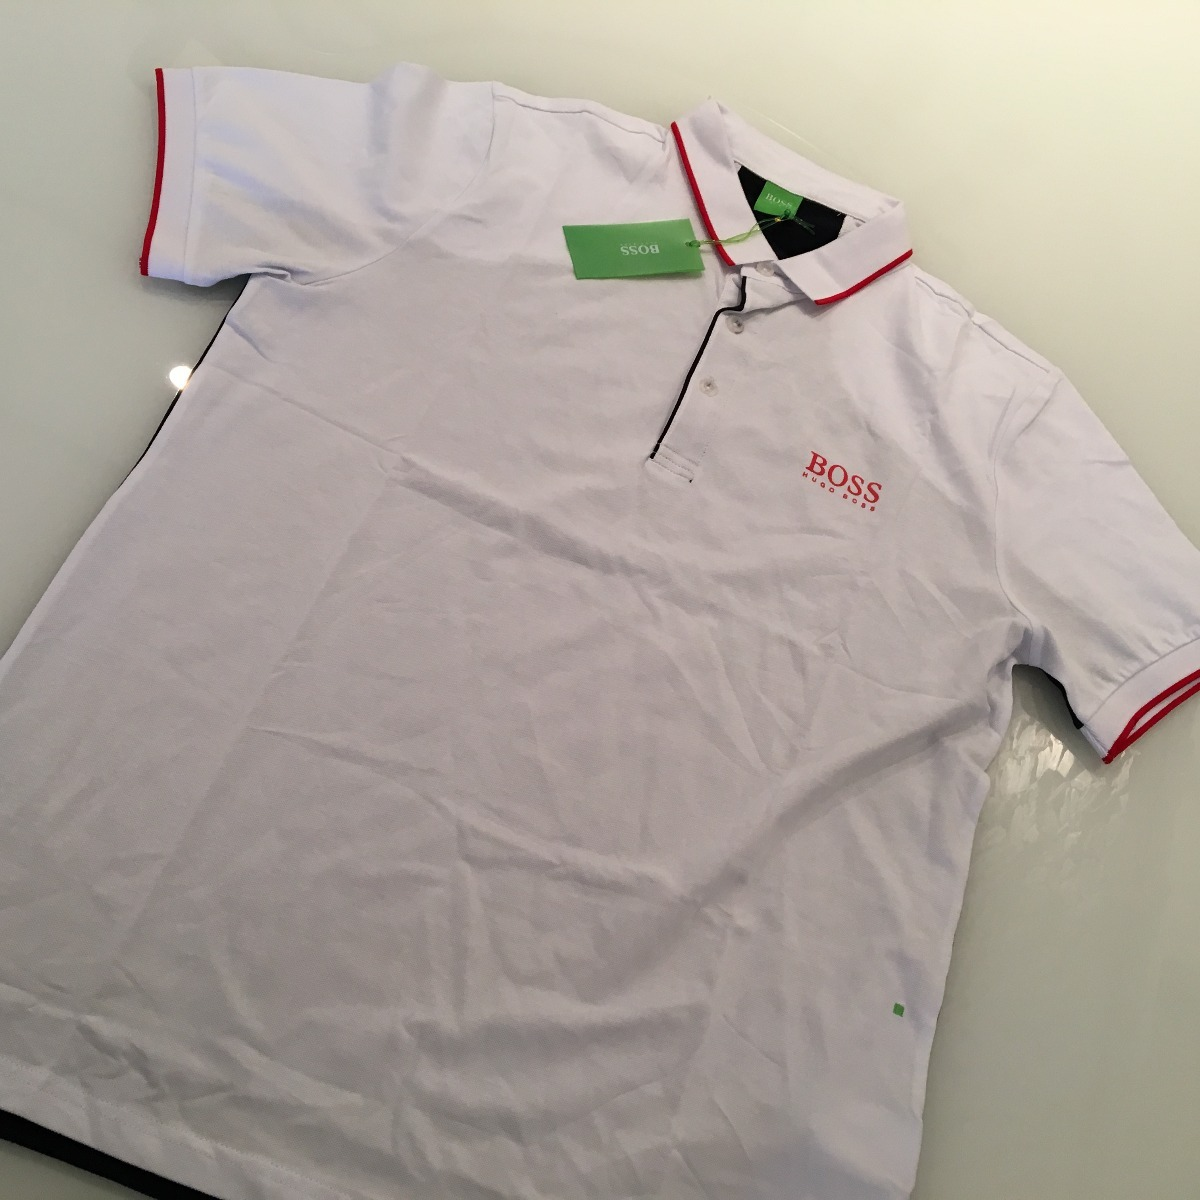 camisetas pólo - hugo boss - original - exclusiva. Carregando zoom. d2cf512c8c3